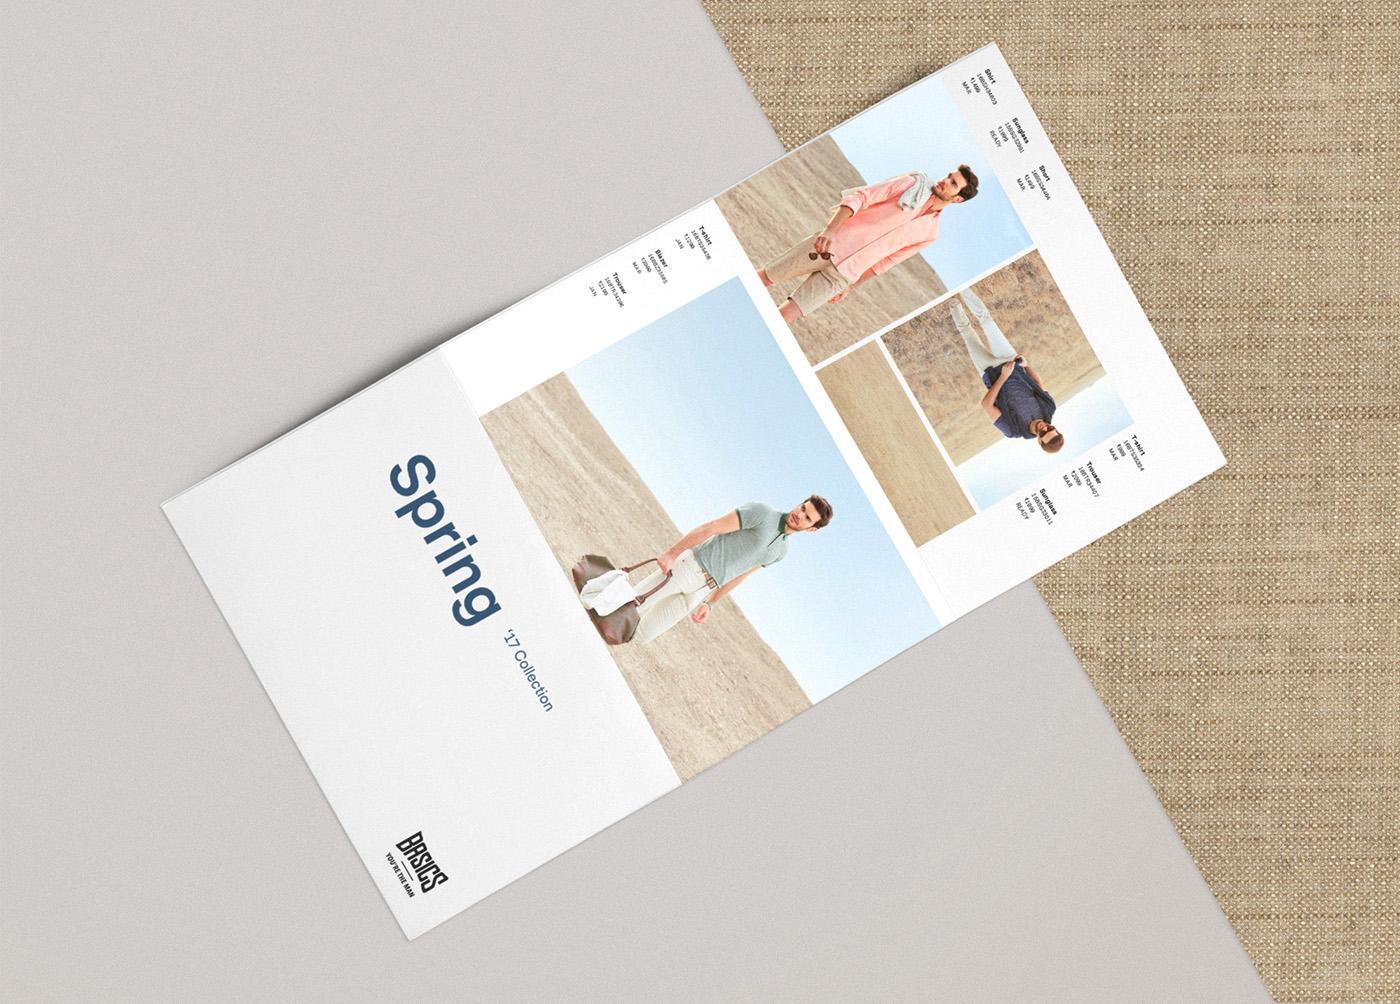 Foldout diseño editorial basics spring 2